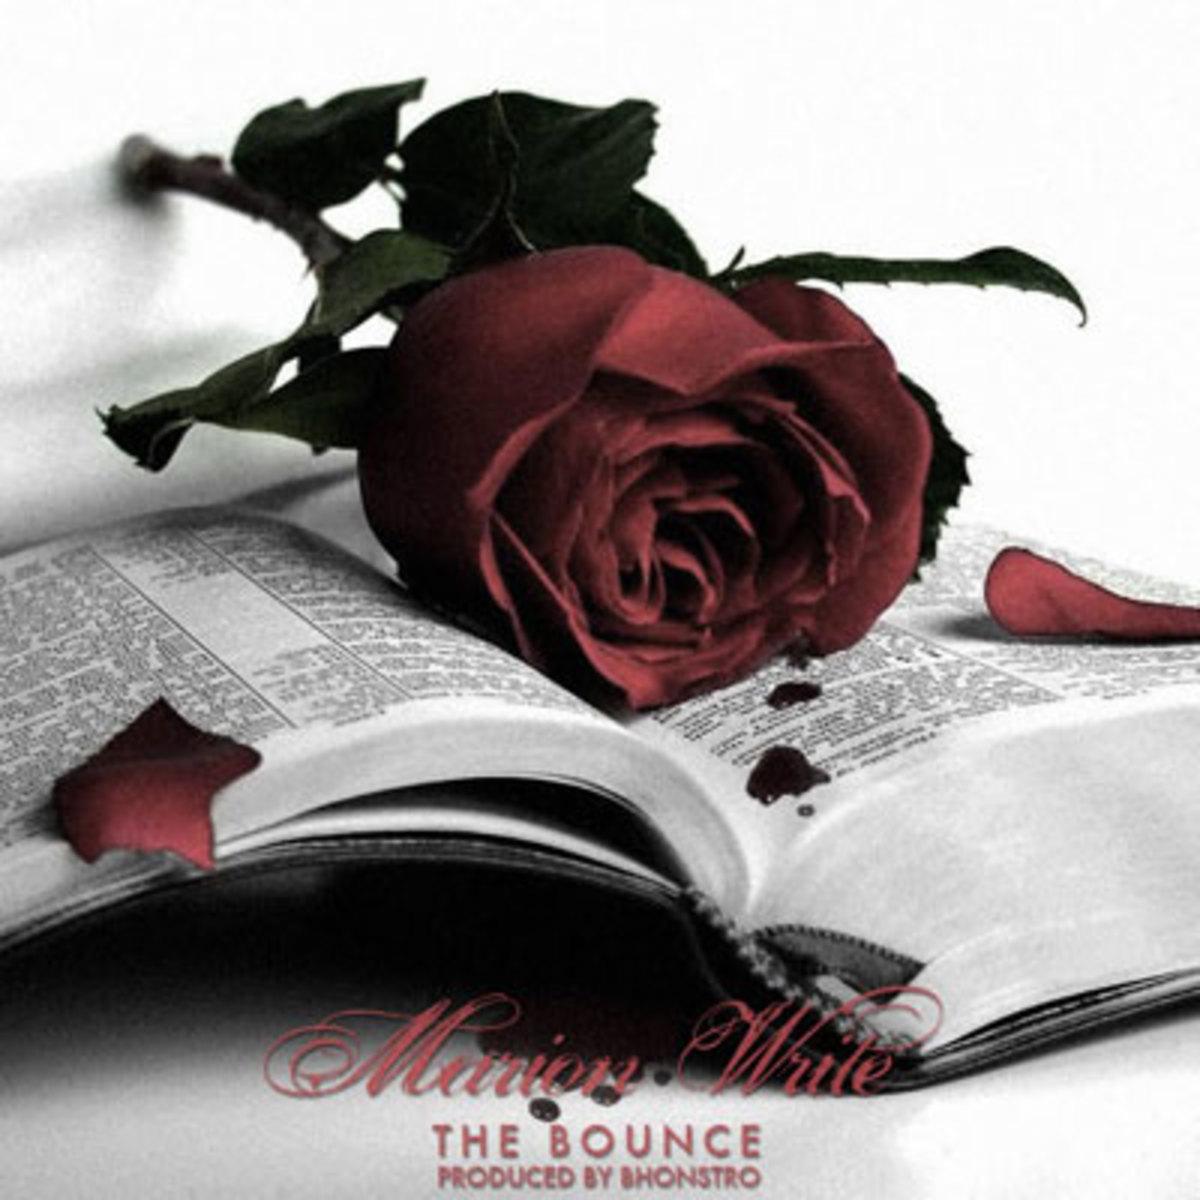 marionwrite-thebounce.jpg